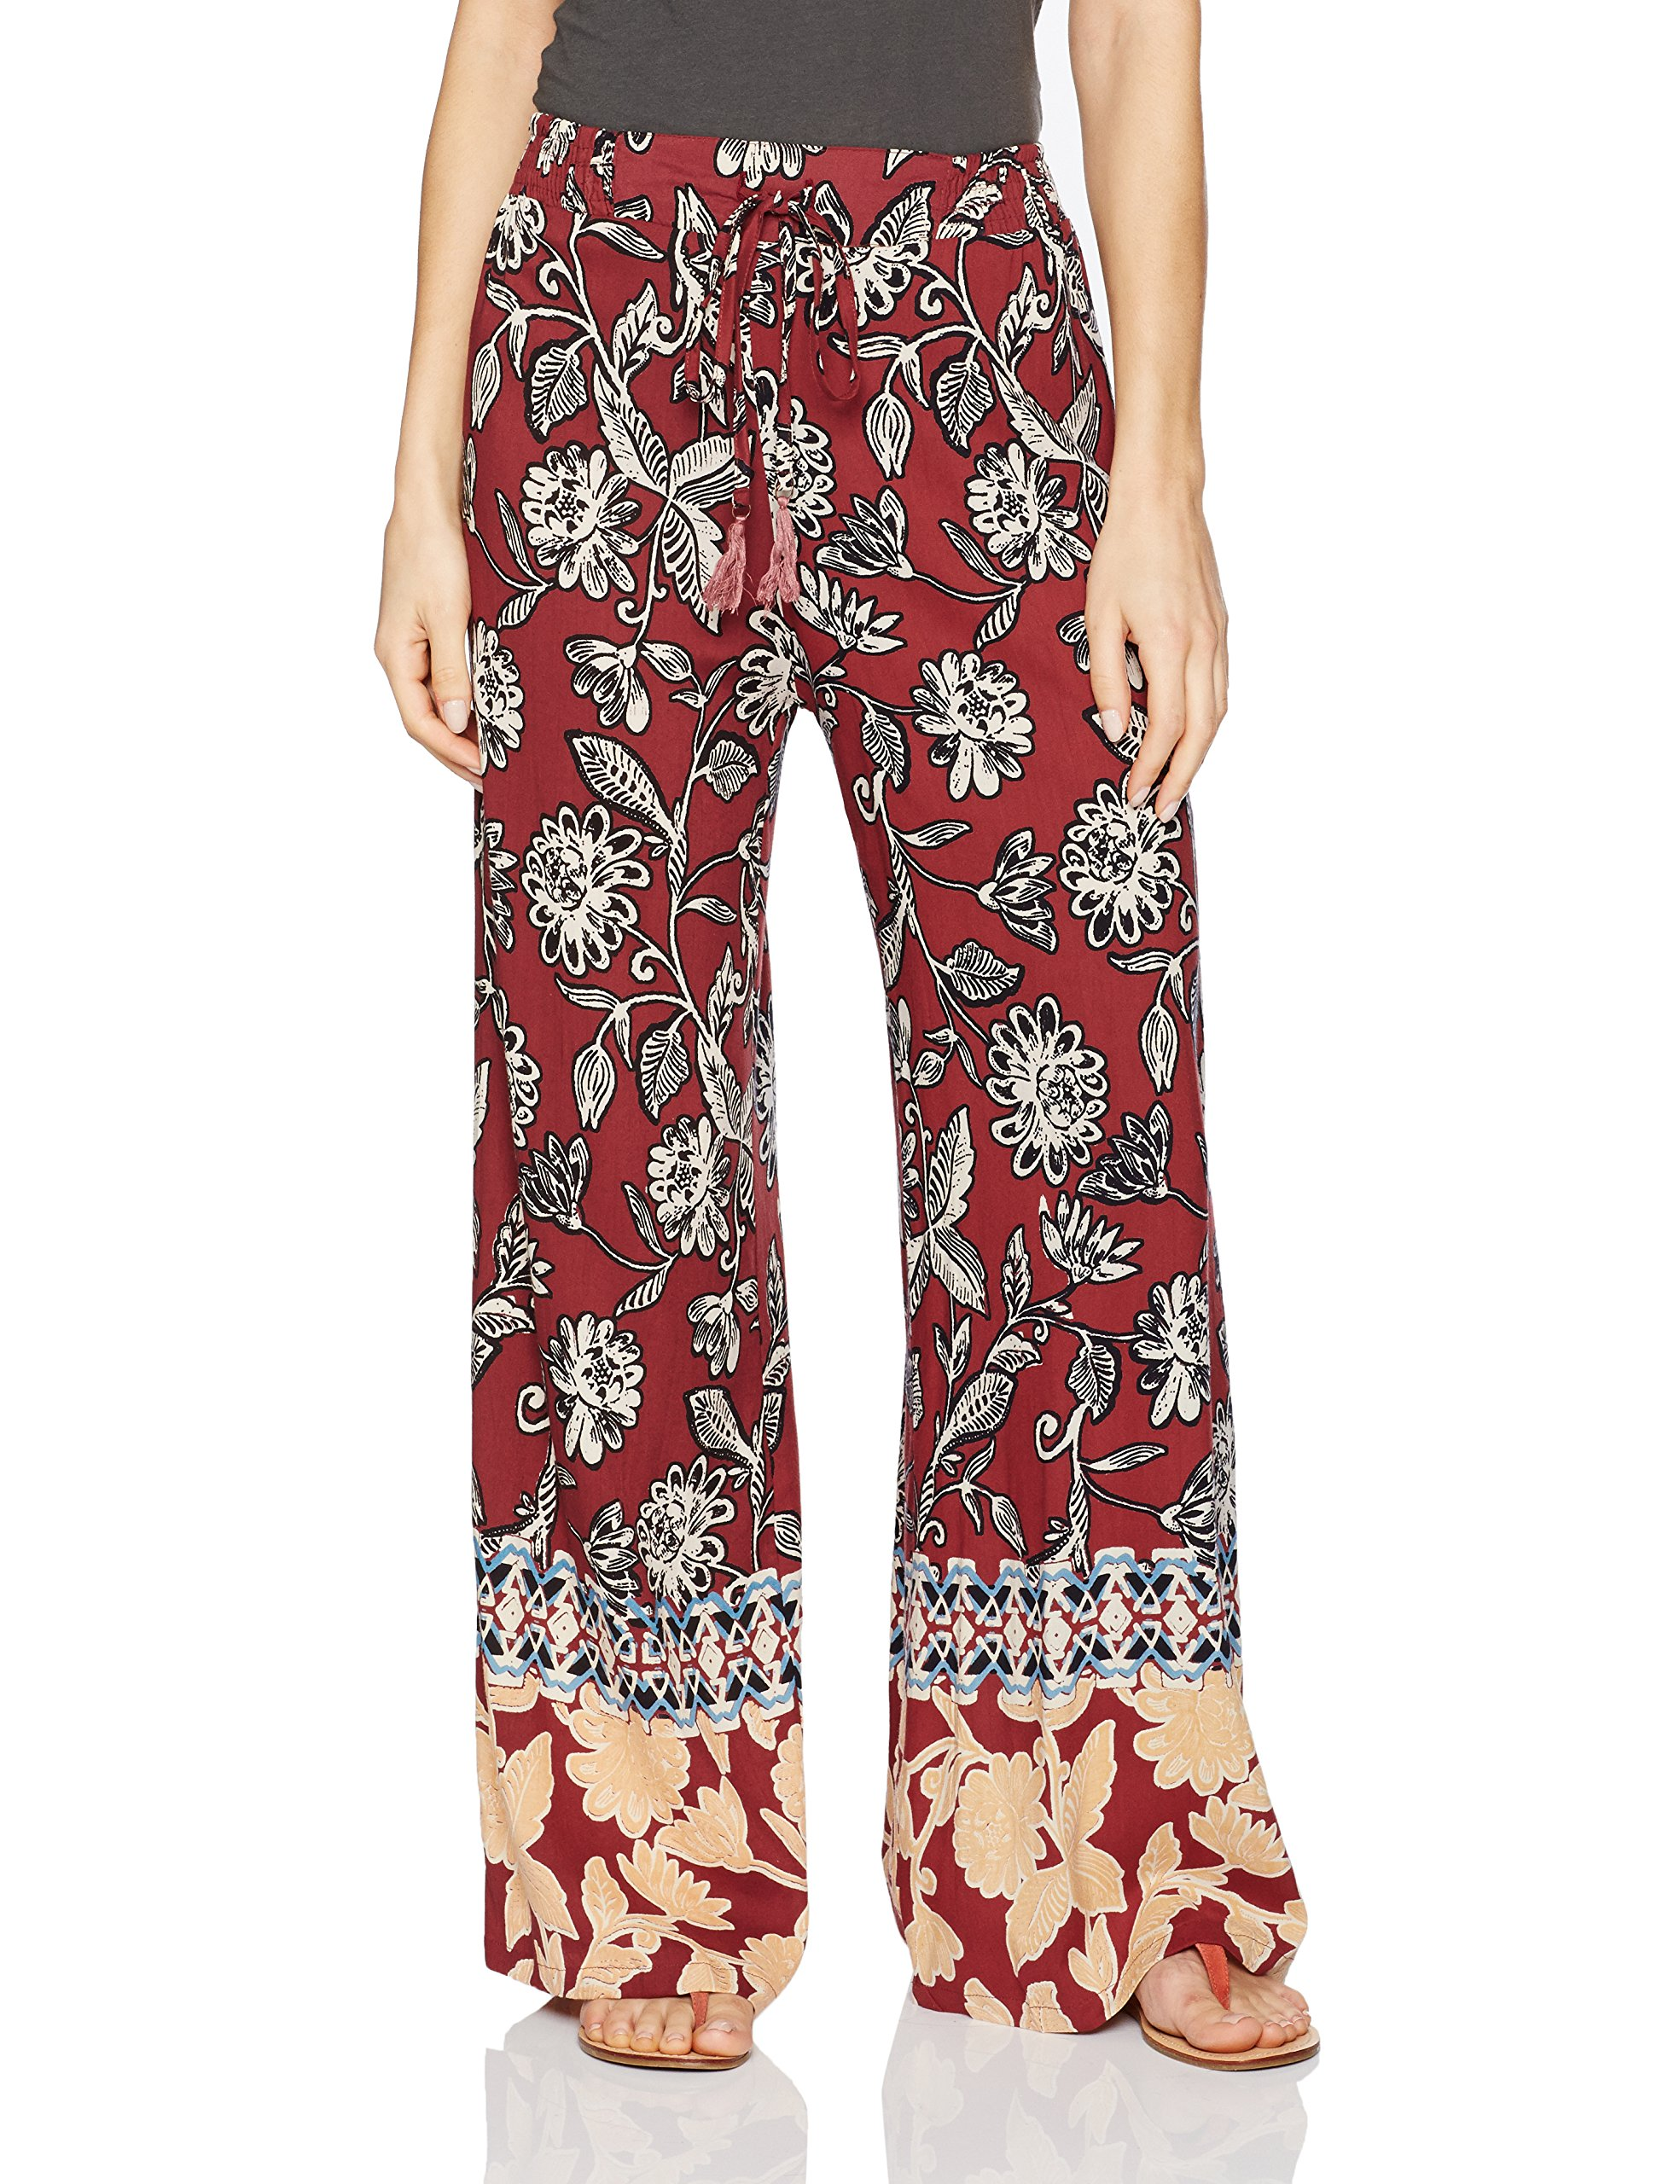 Angie Women's Print Wide Leg Pant with Tassel, Port, Medium